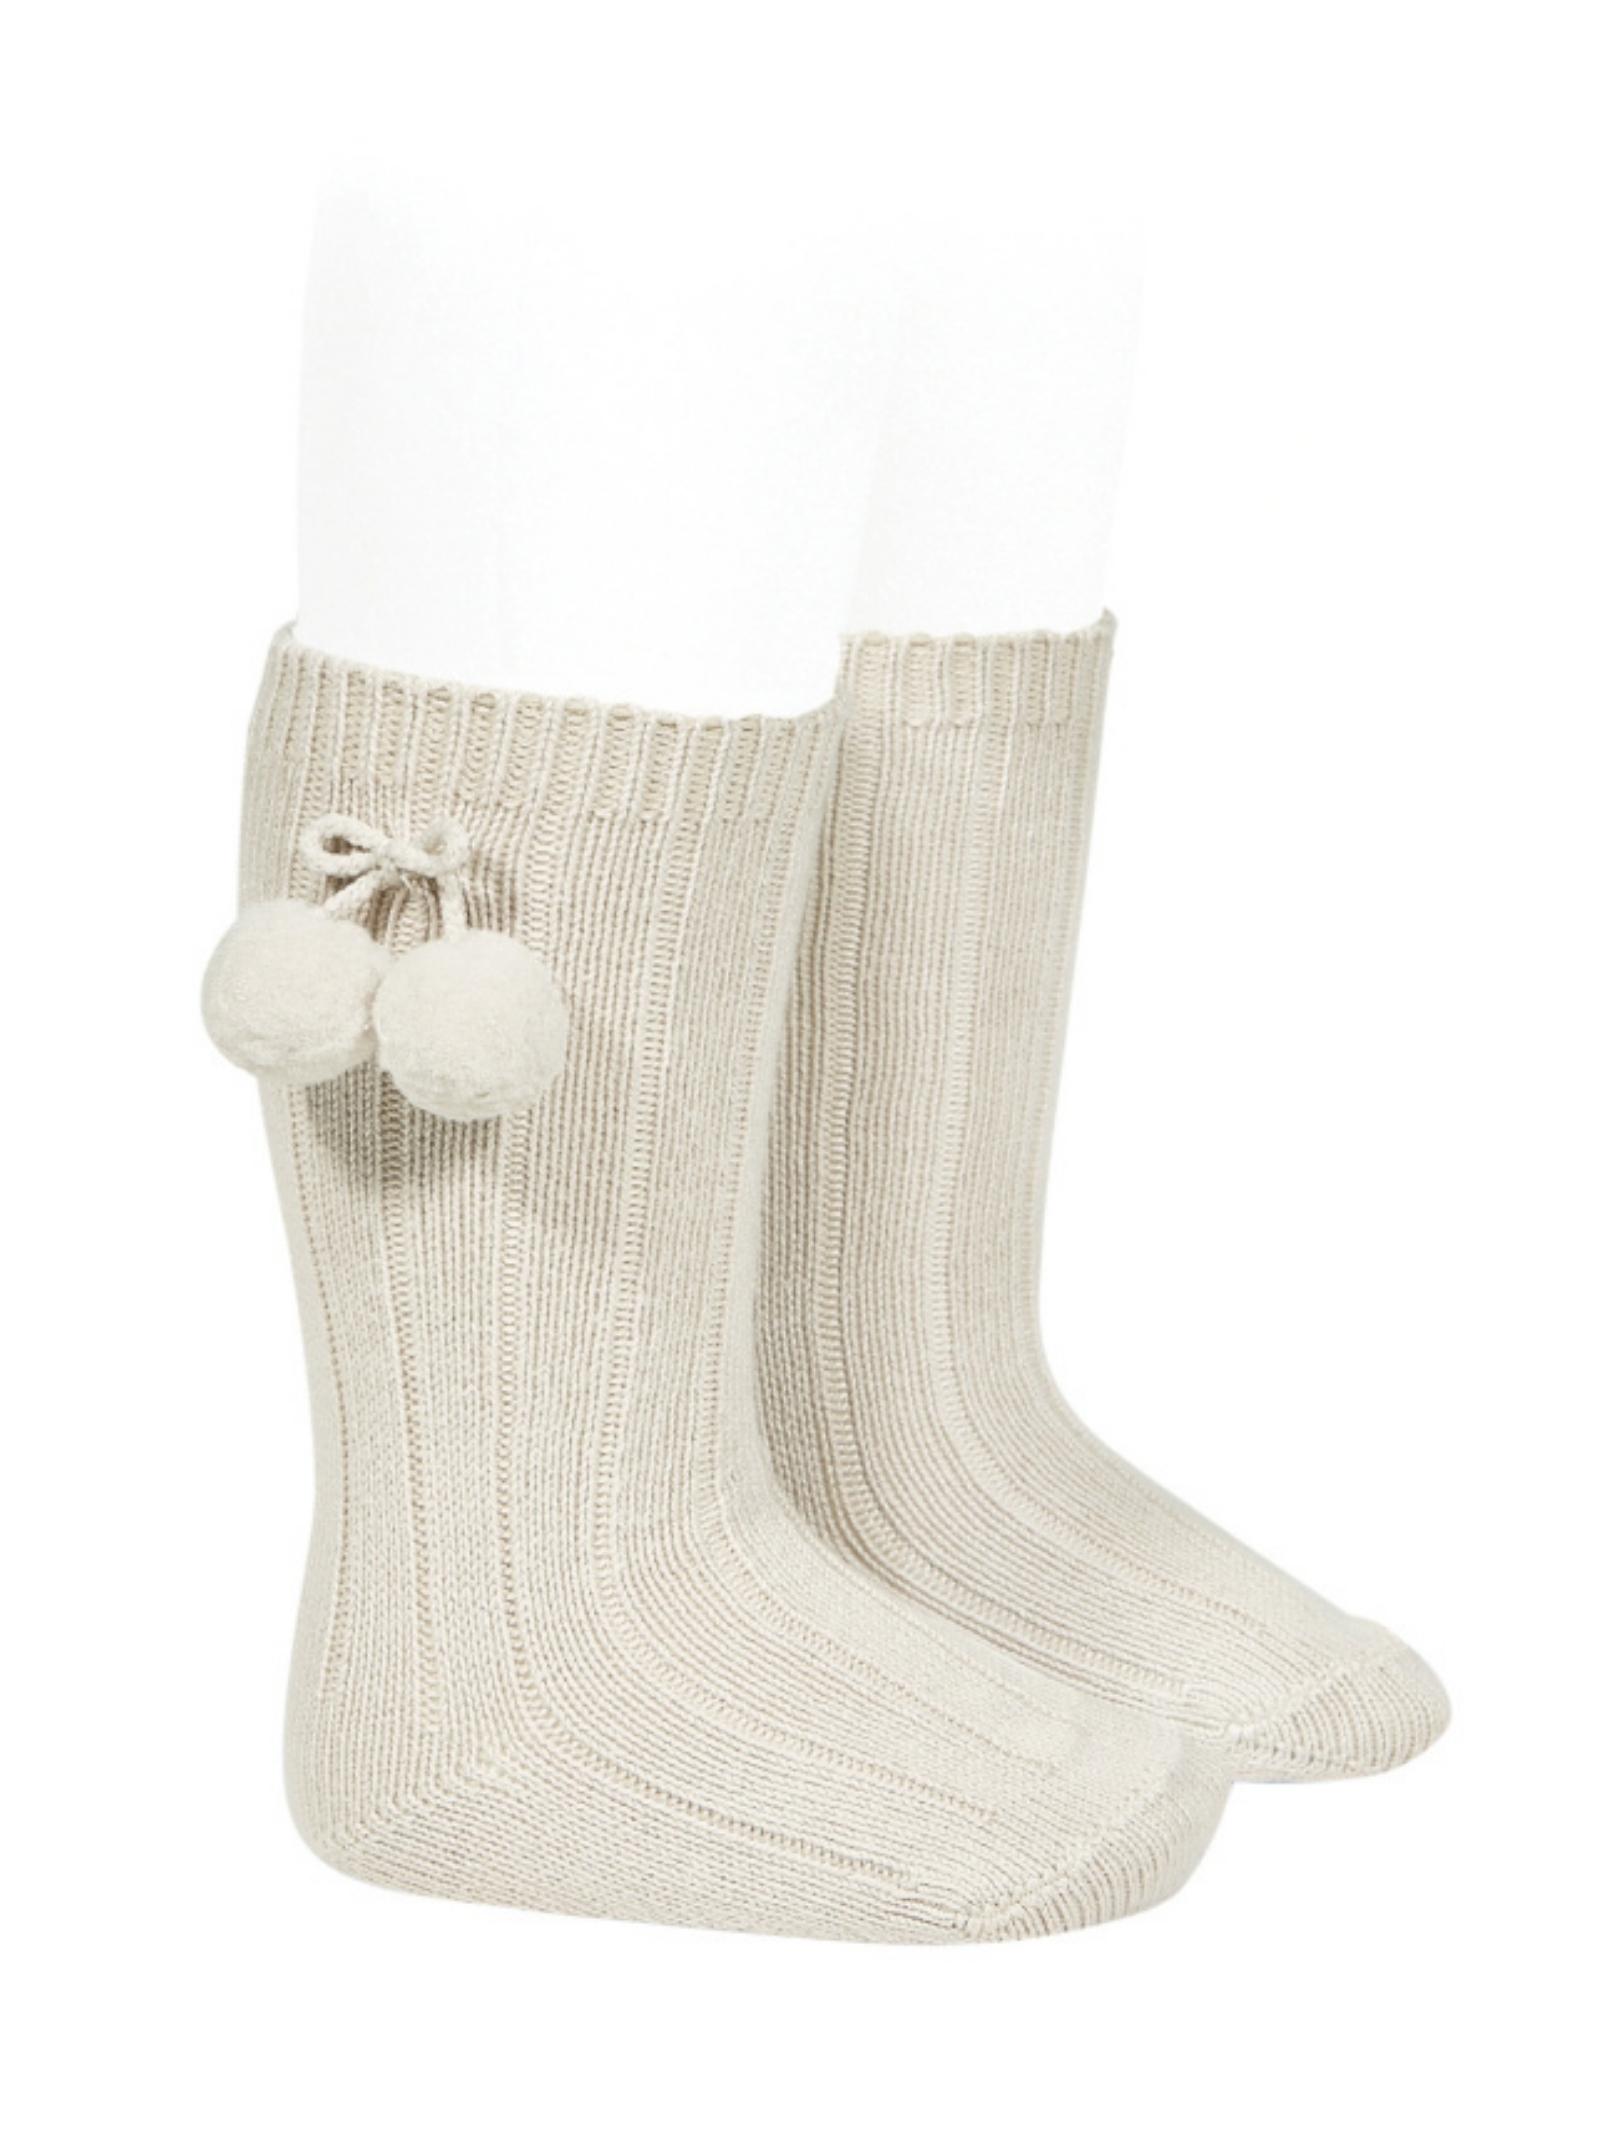 Ribbed Pompon Socks for Girls CONDOR | Socks | 30152304